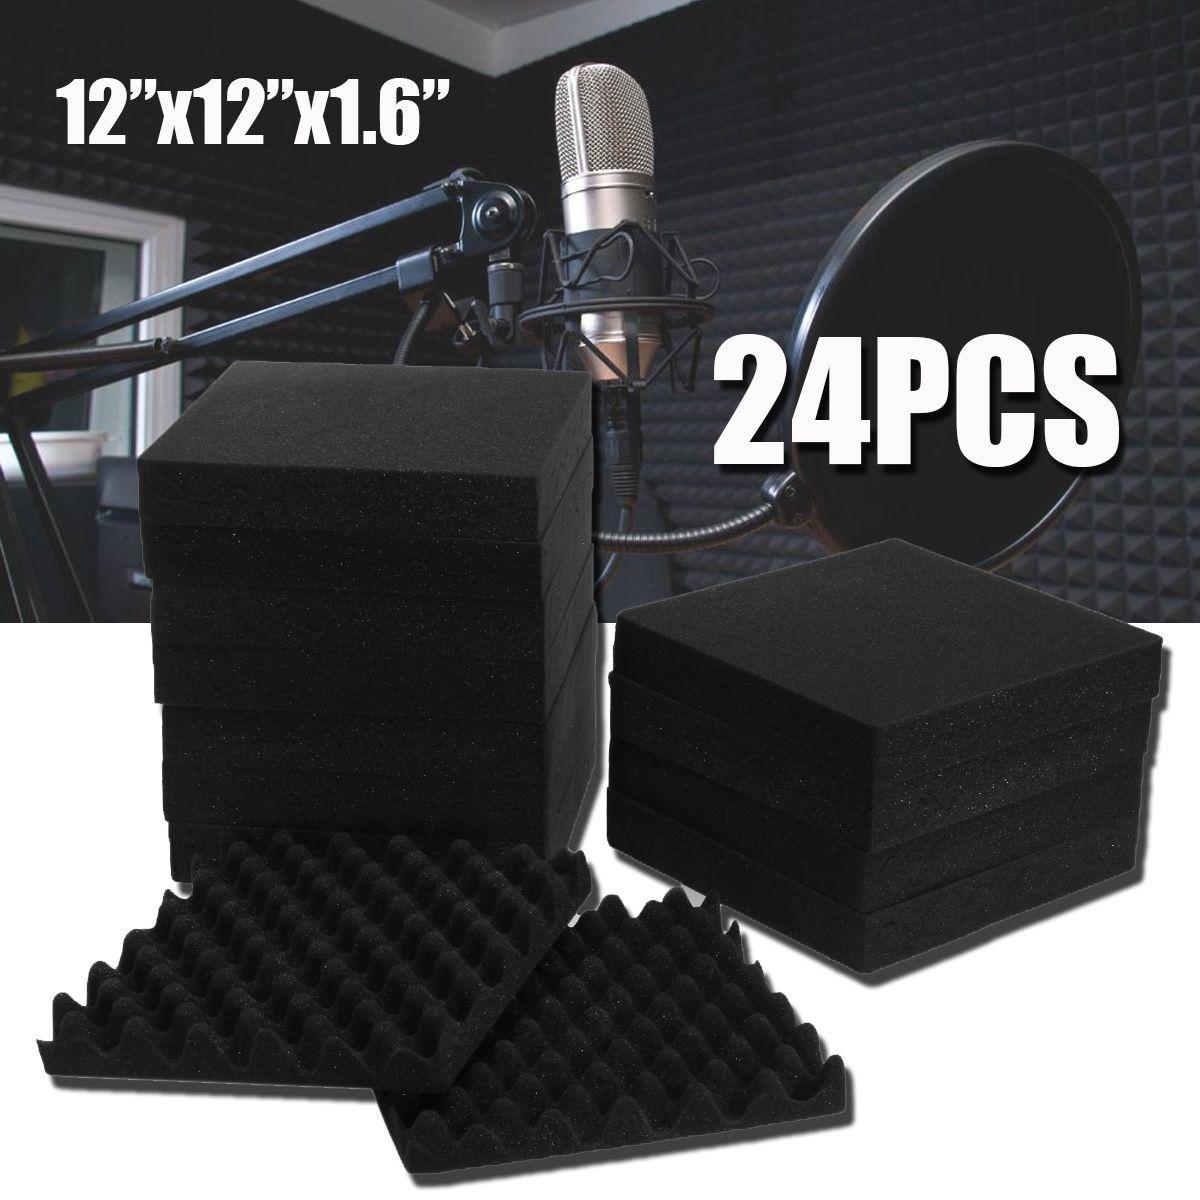 24Pcs 300x300x40mm Soundproofing Foam Studio Acoustic Foam Soundproof Absorption Treatment Panel Tile Wedge Polyurethane Fo